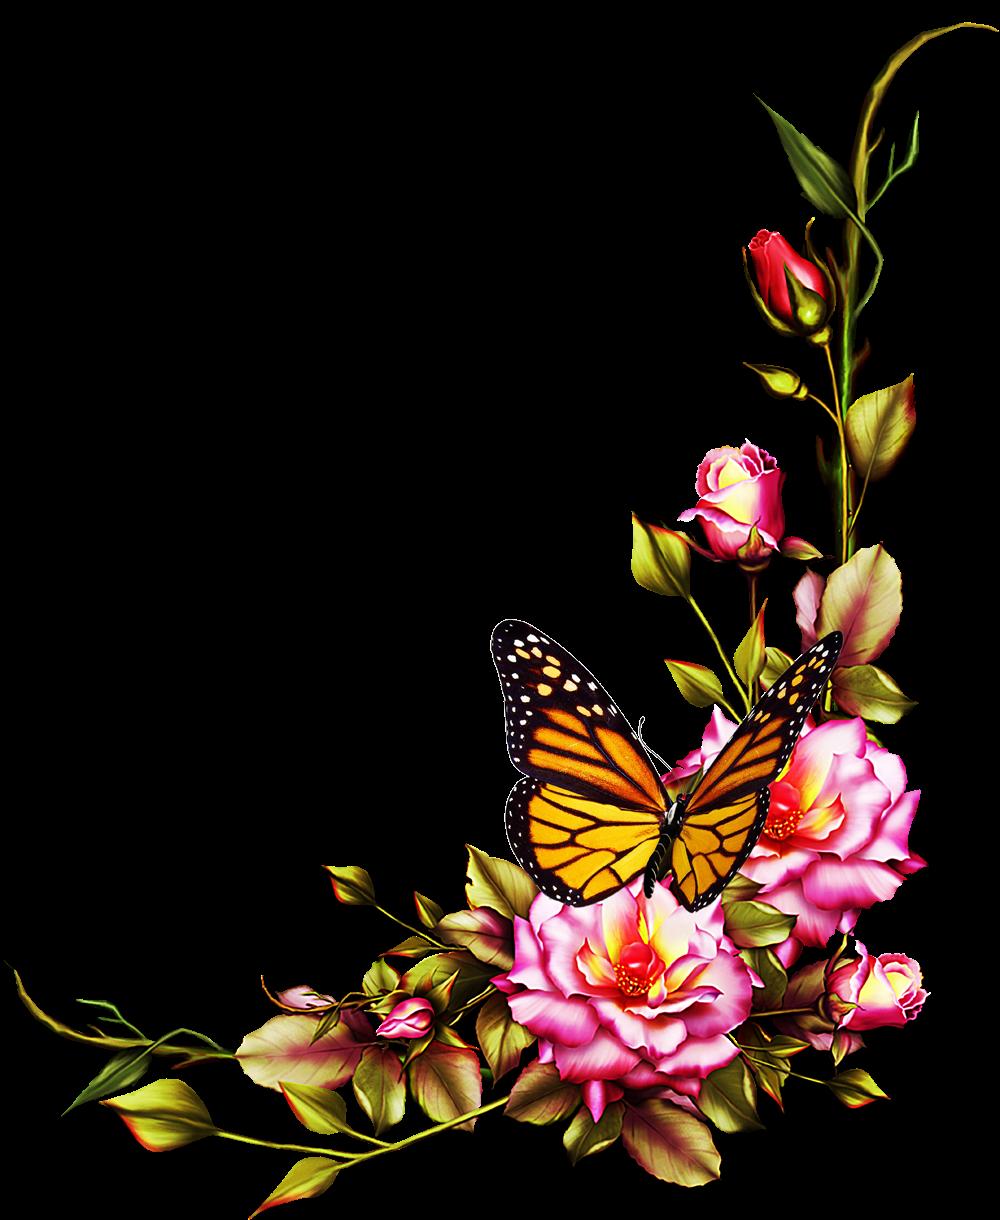 Flower Png File 001 Digital Design Stocksonline